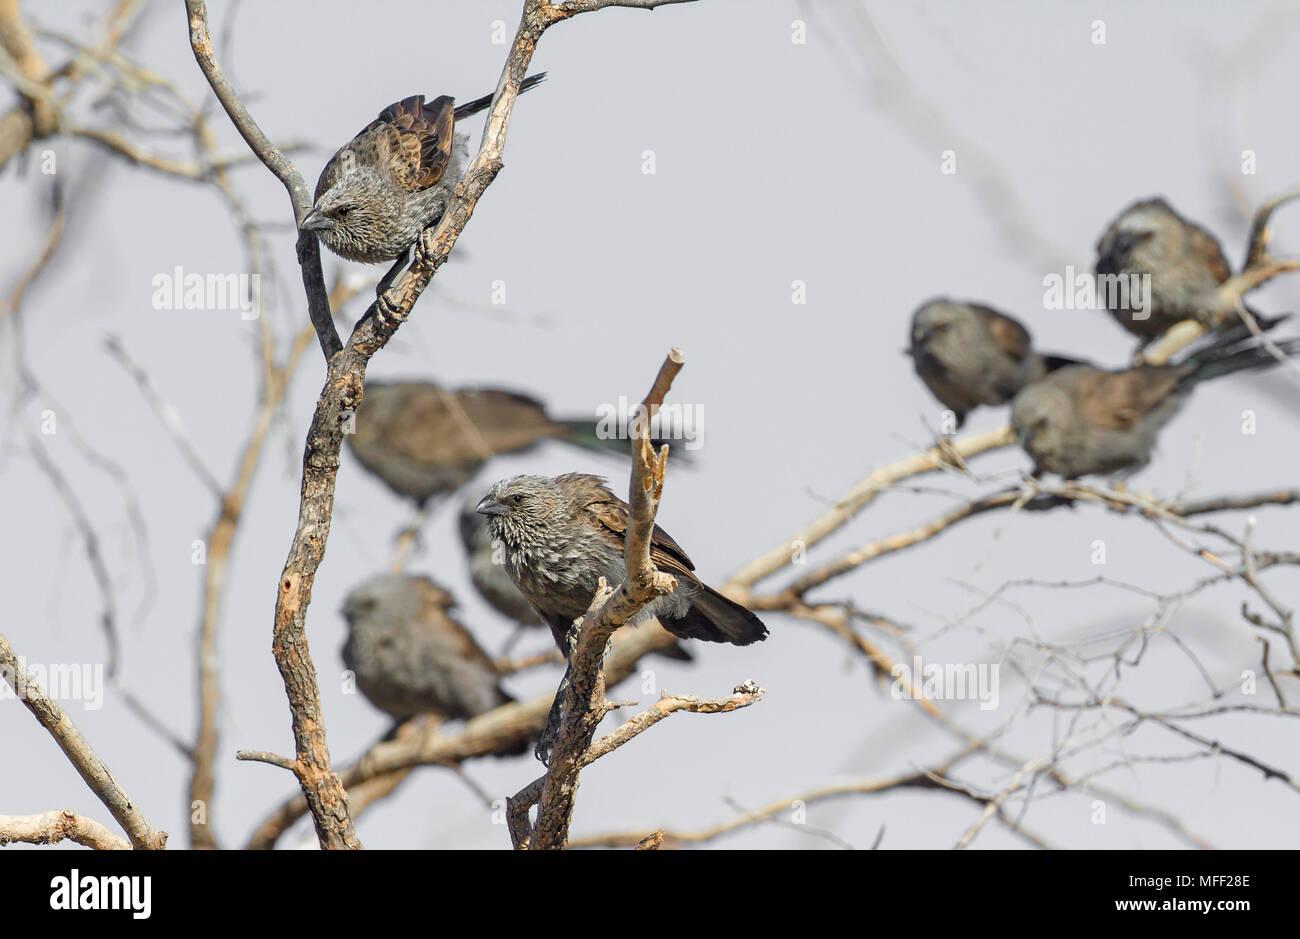 Apostlebird (Struthidea cinerea), Fam. Corcoracidae, Highly social passerines, Carnarvon National Park, Queenland, Australia - Stock Image